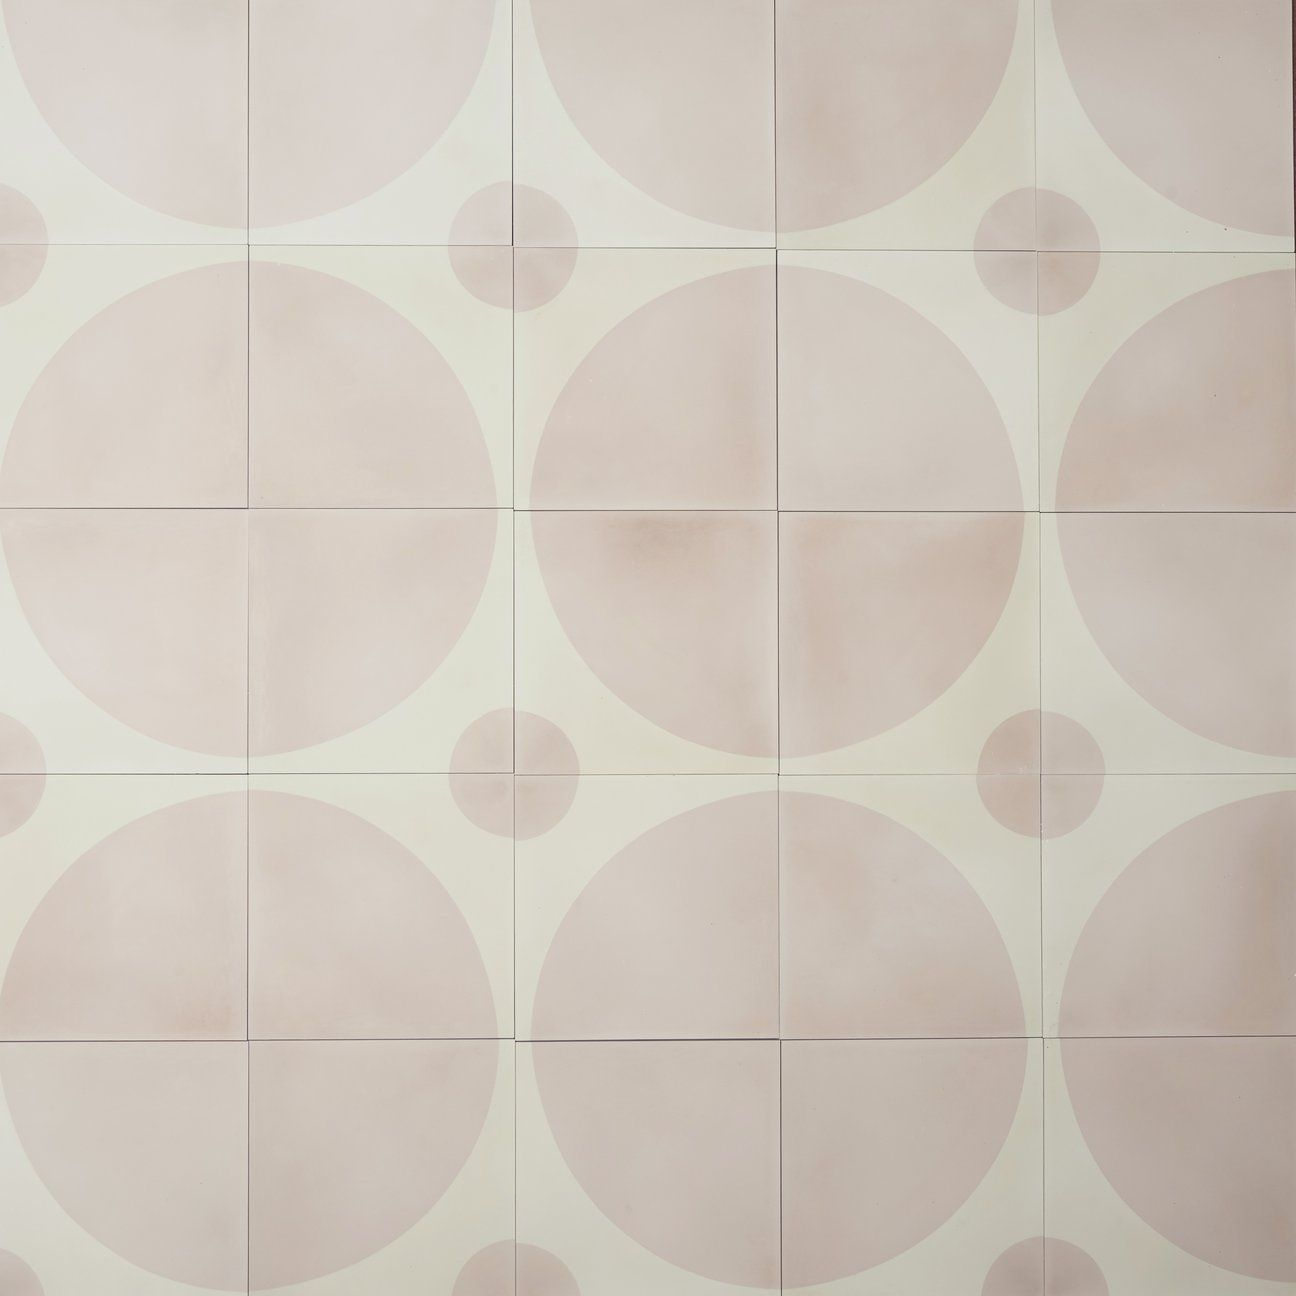 Cooler Gallery Patterned Quarter Arch Heather Mckenna Box Of 13 Concrete Love In 2020 Encaustic Tile Tile Work Concrete Tiles